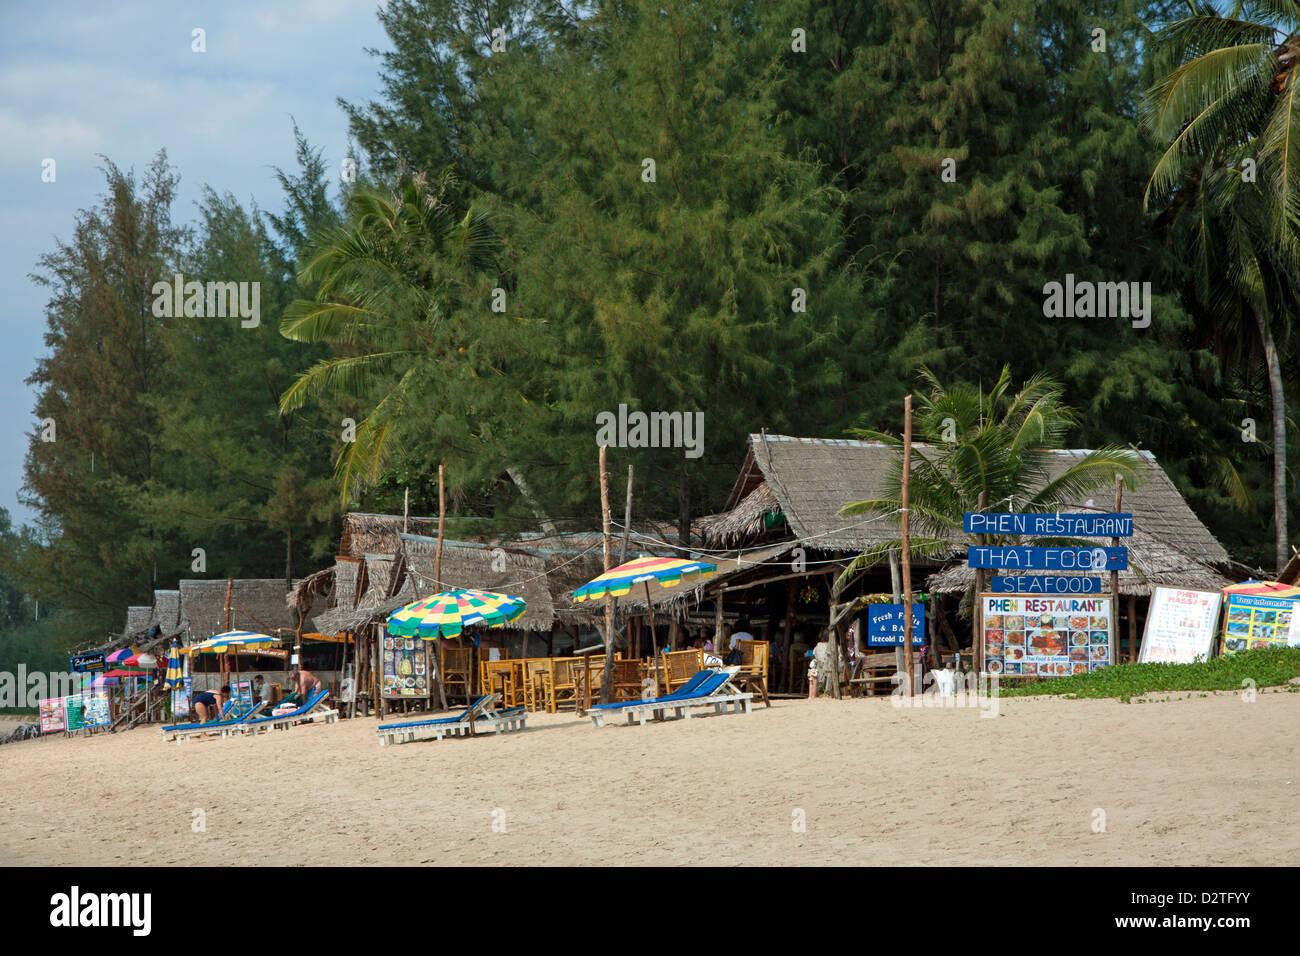 Khuk Khak Beach Restaurants